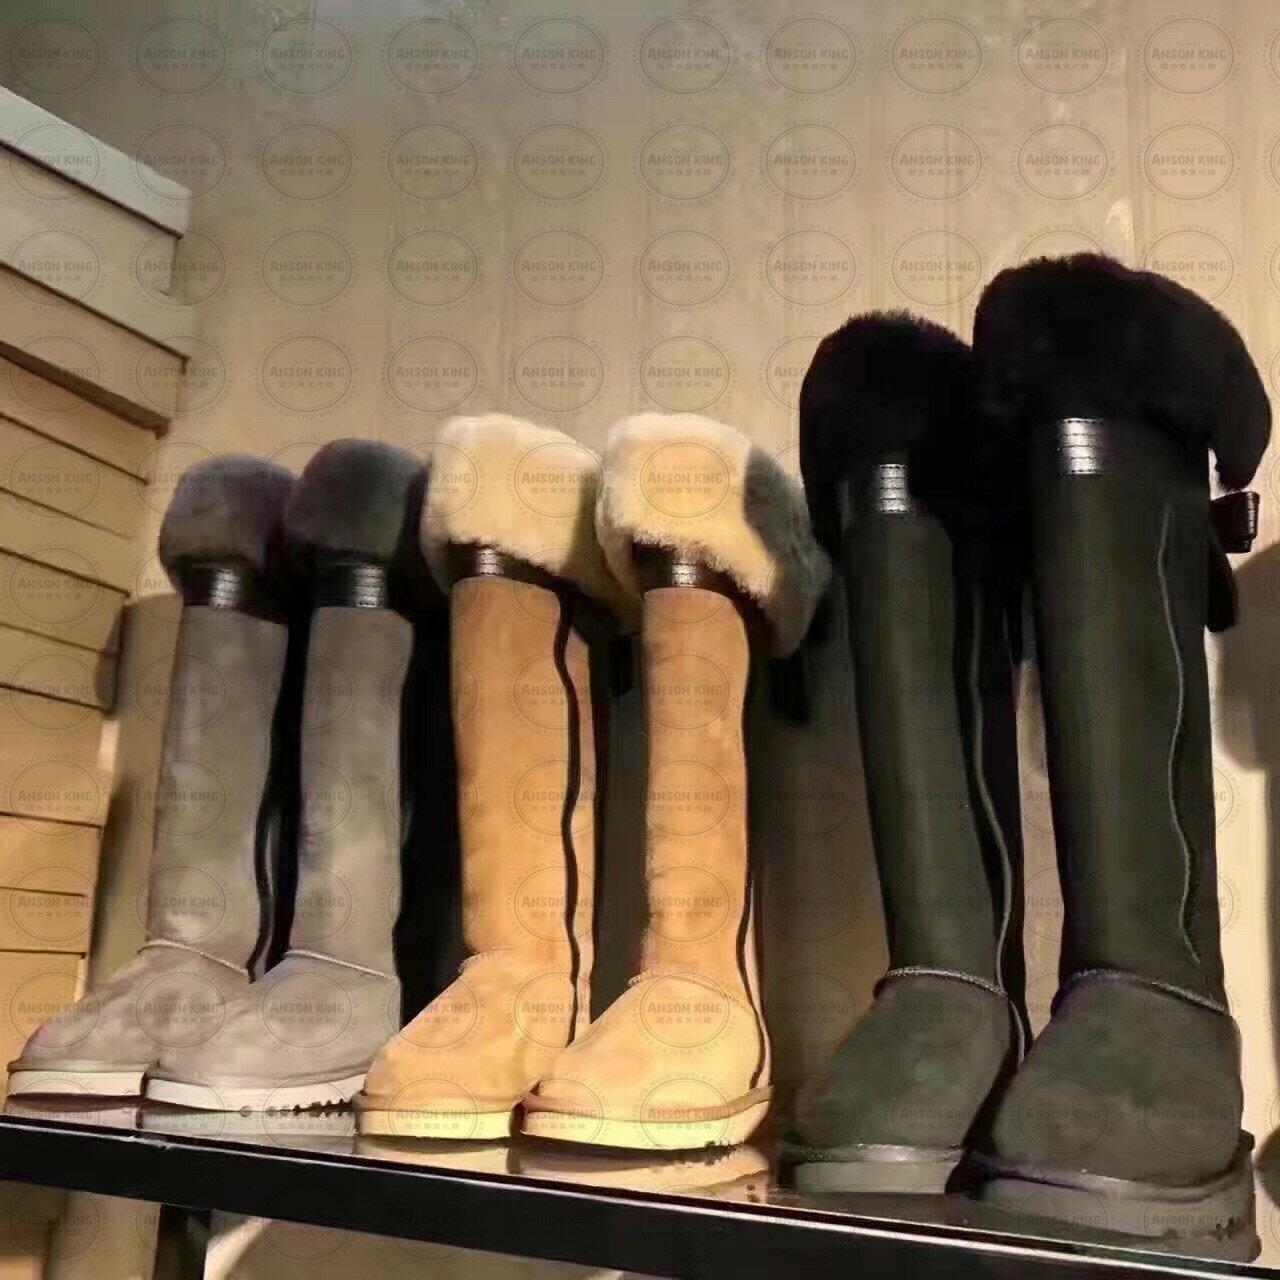 OUTLET正品代購 澳洲 UGG 千頌伊同款過膝羊皮毛雪靴 保暖 真皮羊皮毛 雪靴 短靴 灰色 2